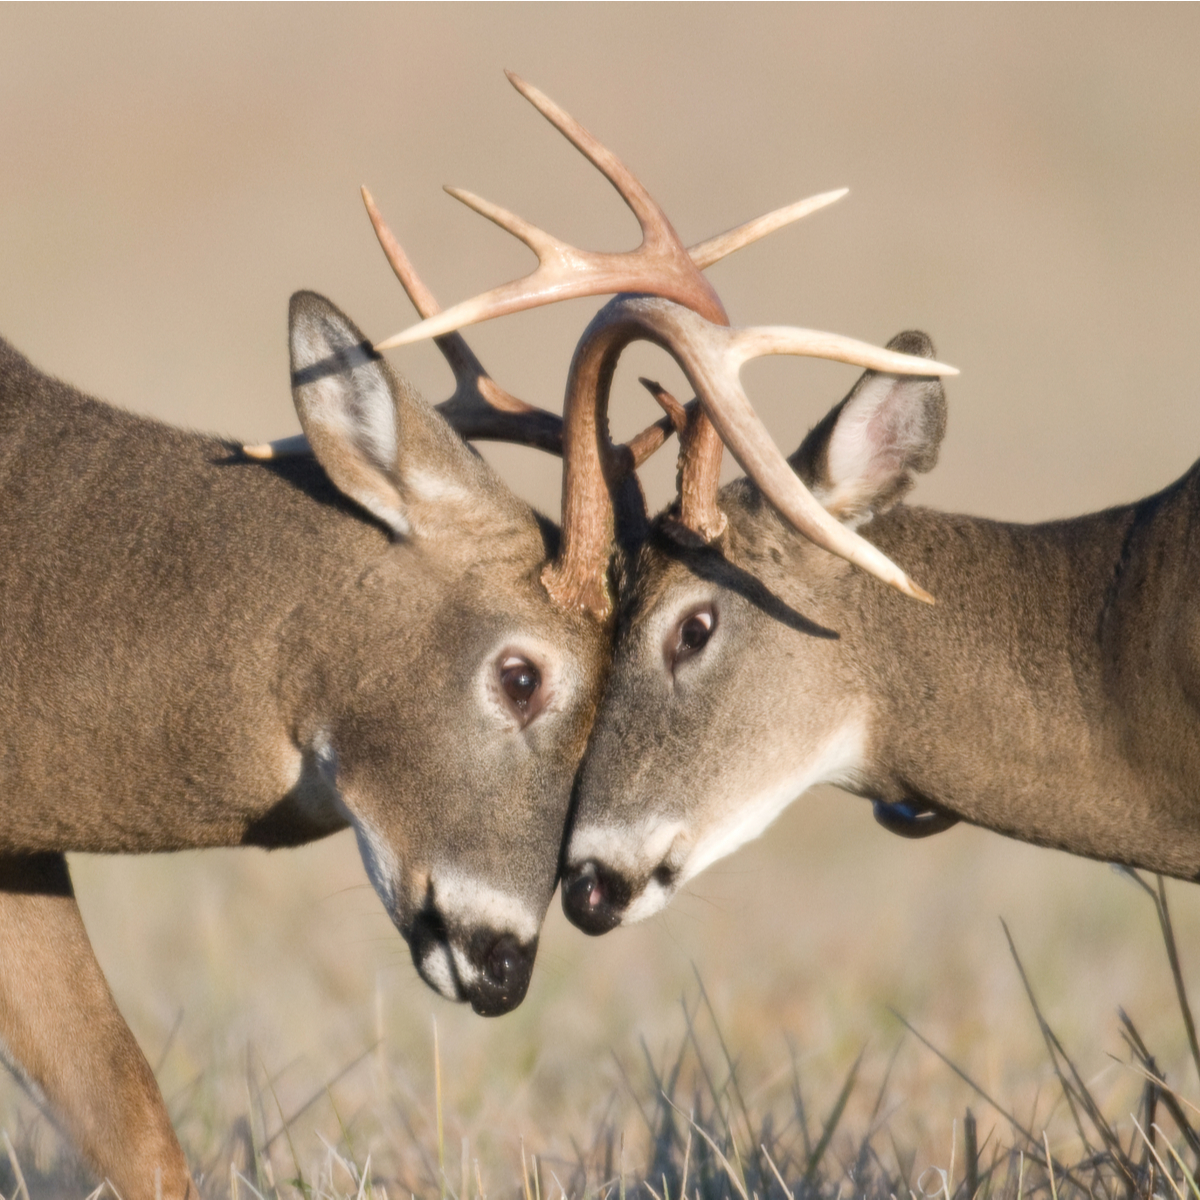 Zoom Doorbell camera catches a couple of deer fighting over food. {Watch}